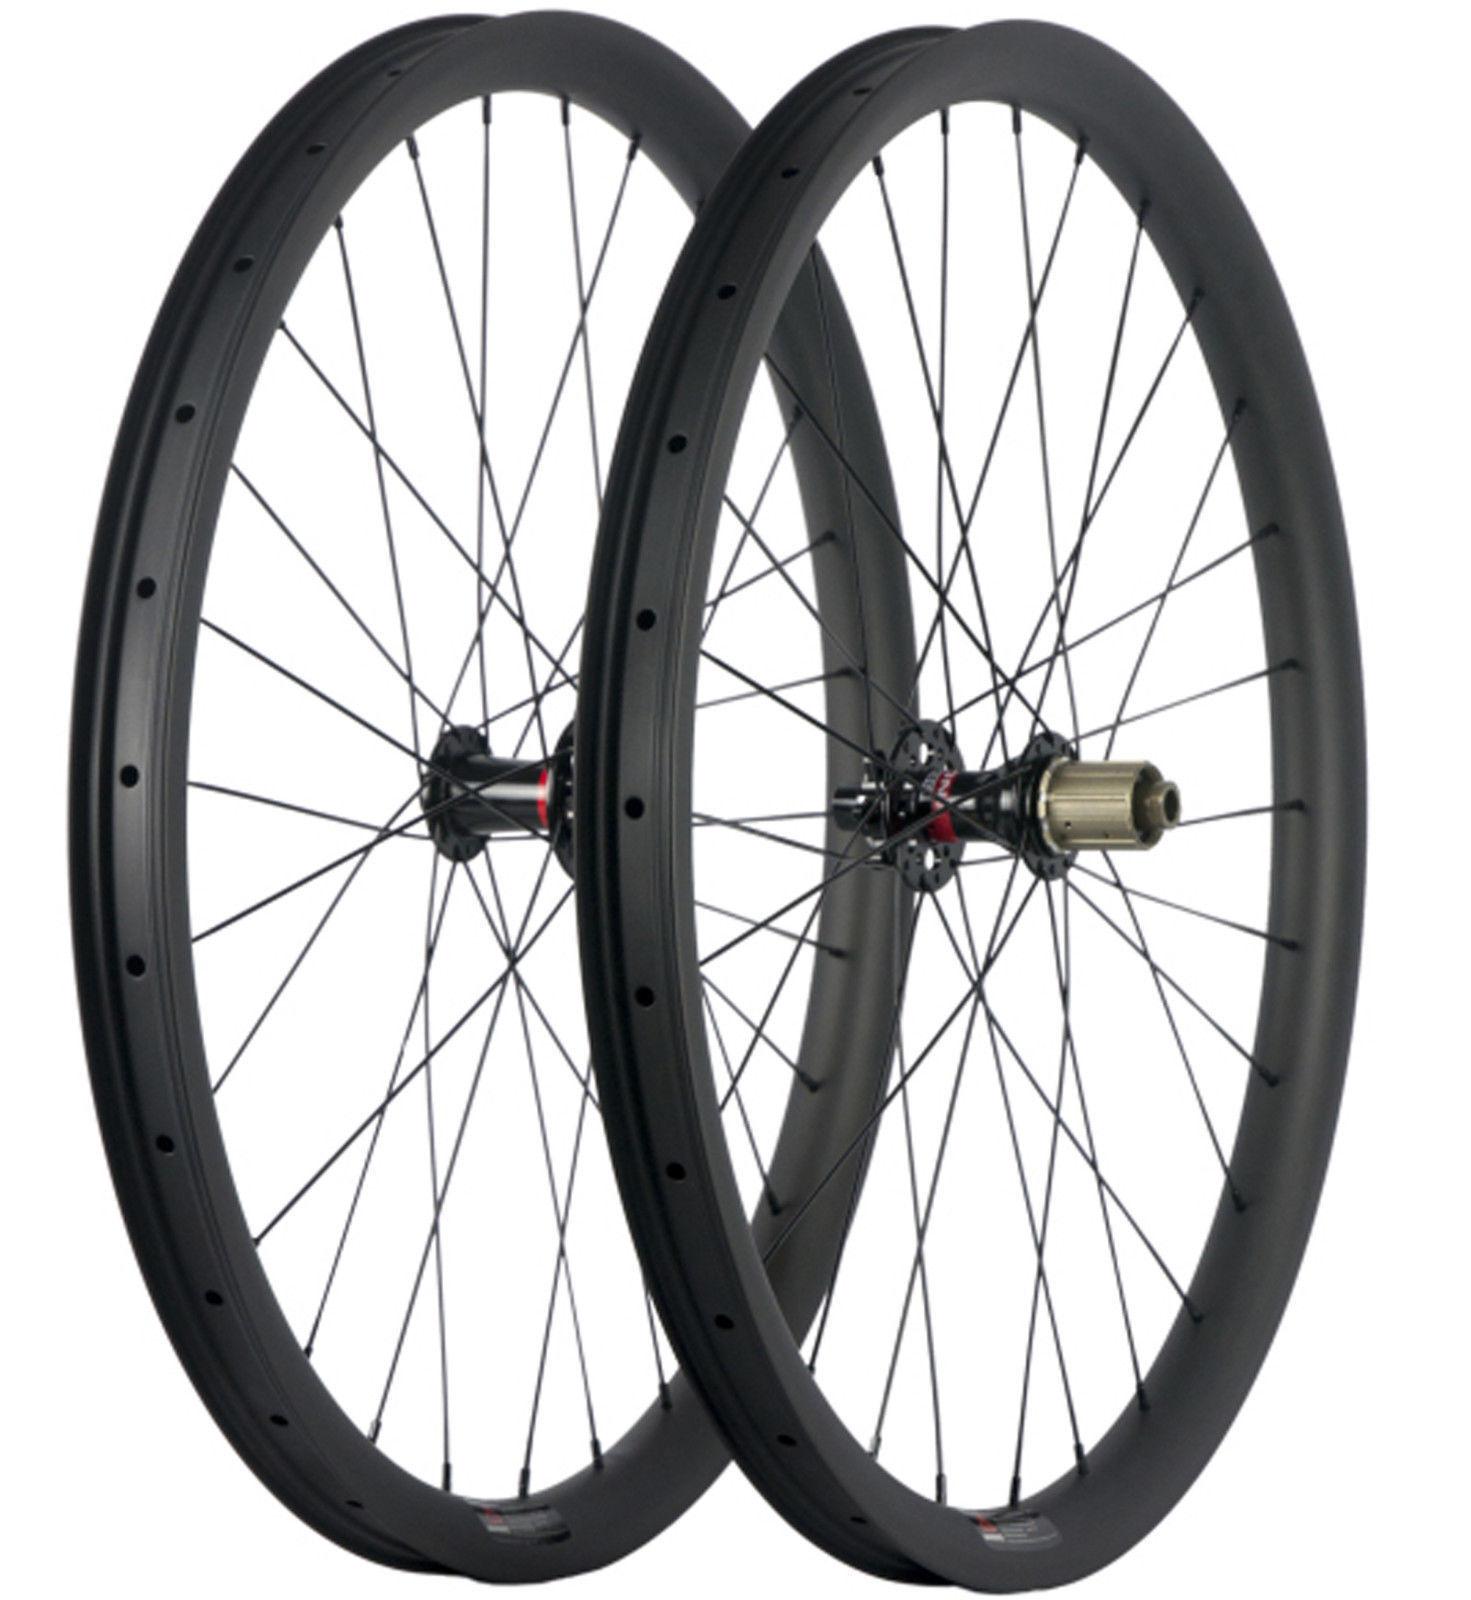 27.5 inch 30mm wide 30mm depth carbon mountain bike wheels 650B bicycle wheels